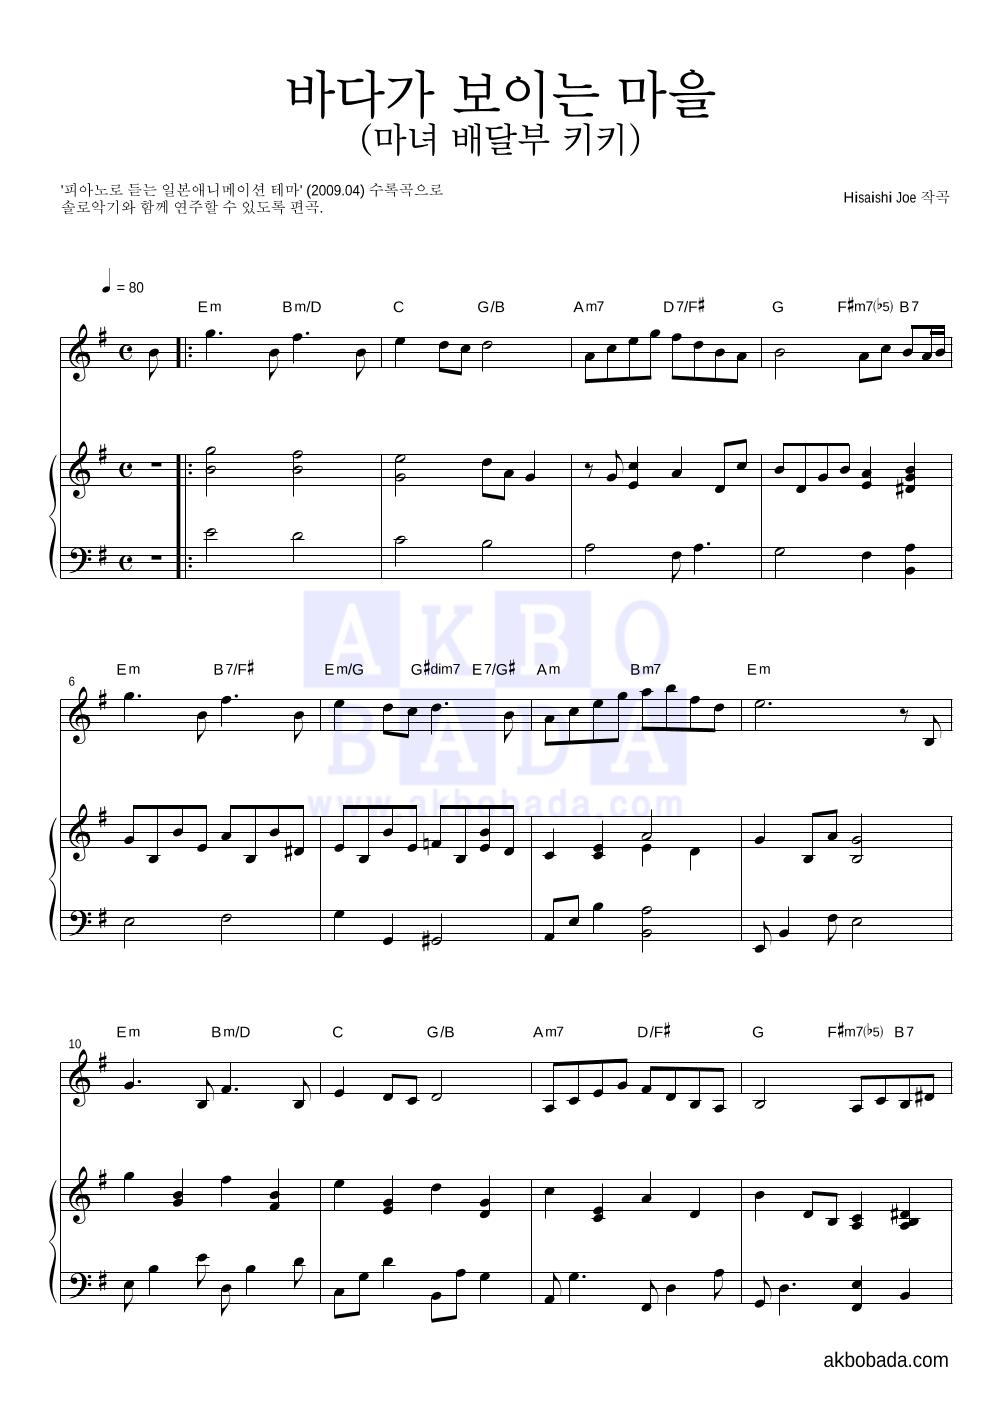 Hisaishi Joe - 海の見える街 / 바다가 보이는 마을 (마녀 배달부 키키) Solo&피아노 악보